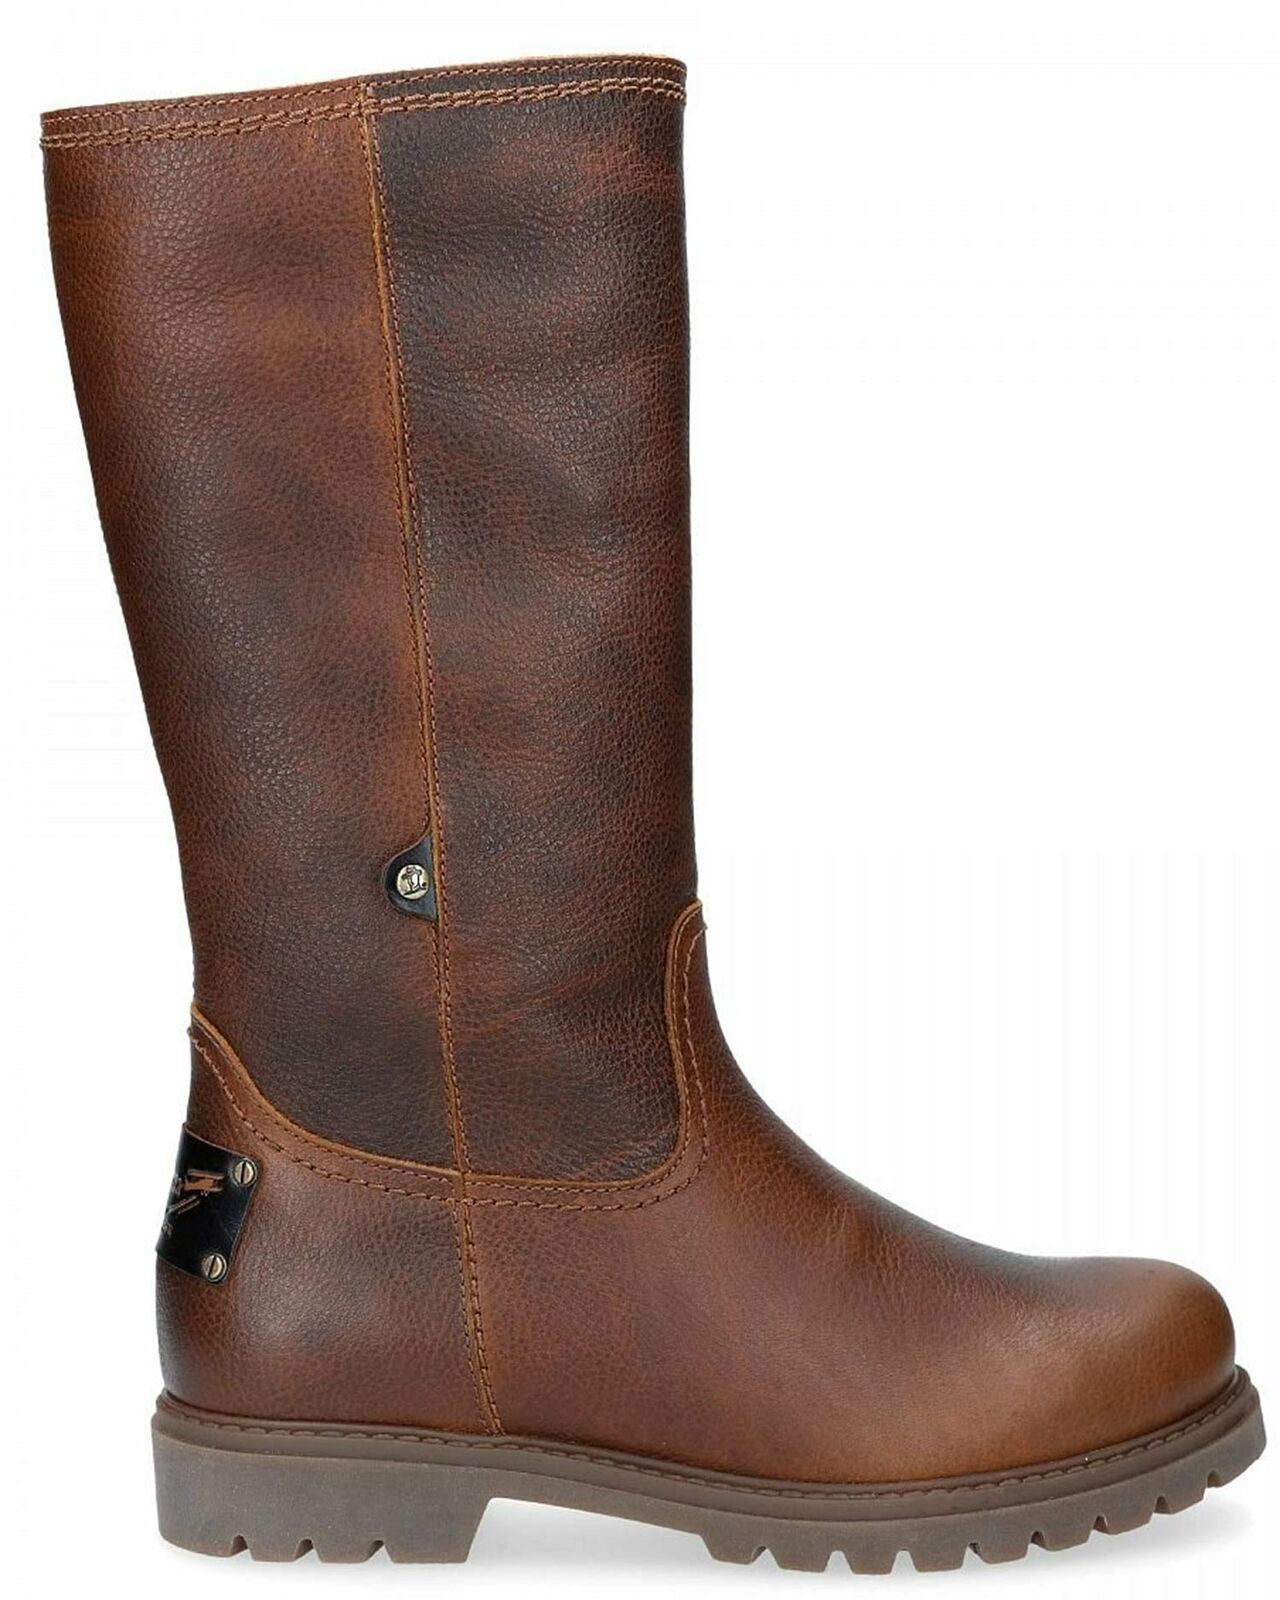 Panama Jack Bambina Igloo B29 Damen Stiefel Winterstiefel Boots Braun Brown Neu Winterstiefel Damen Ideas Of Winterstiefel Damen Boots Riding Boots Braun